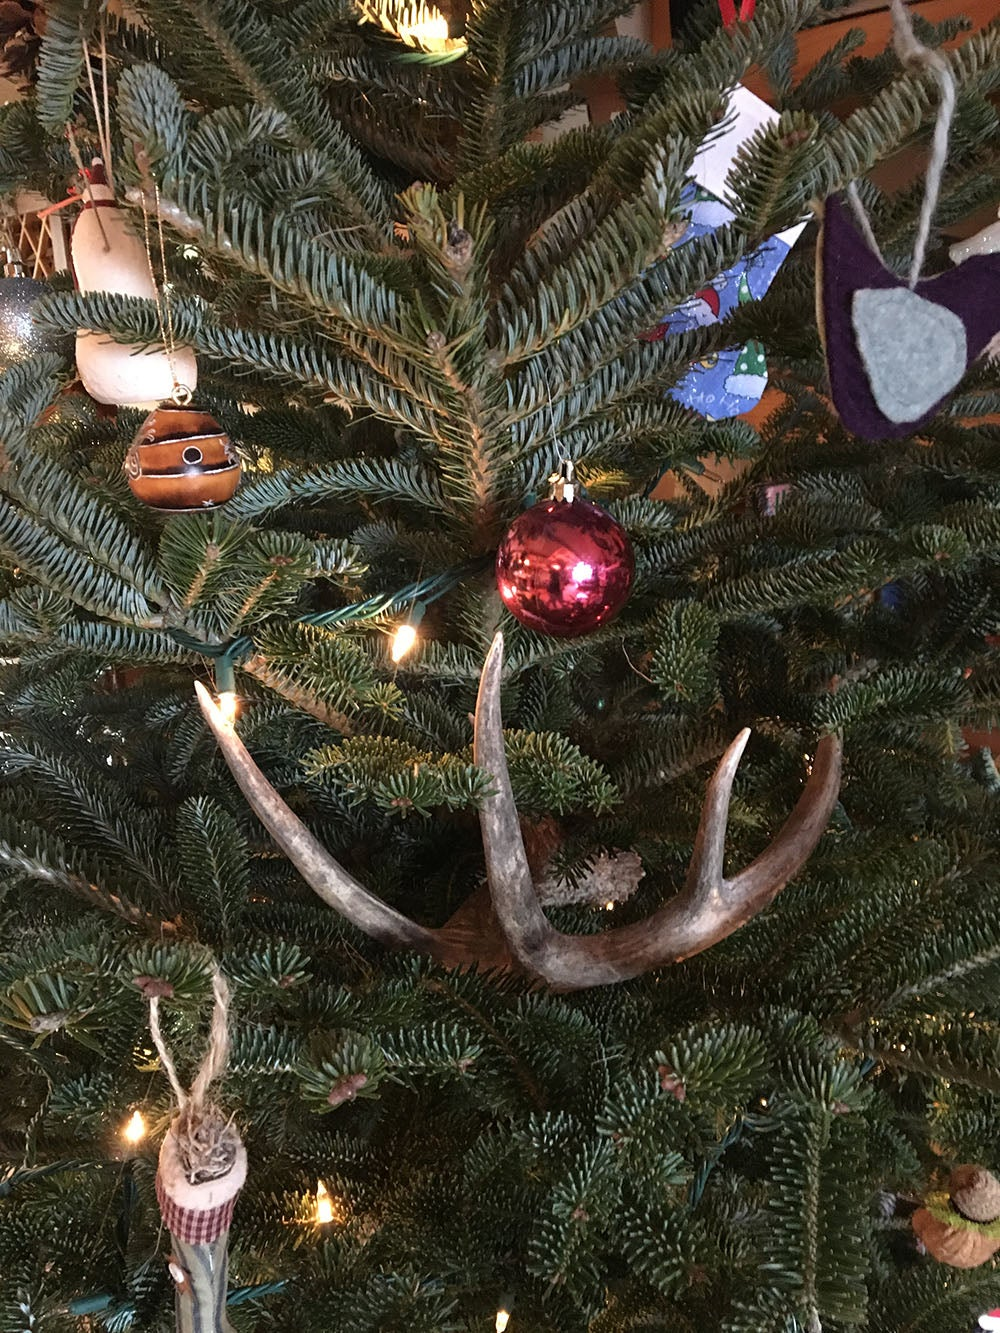 Hunting, Deer Hunting, Whitetails, Antler decorations, Dave Hurteau